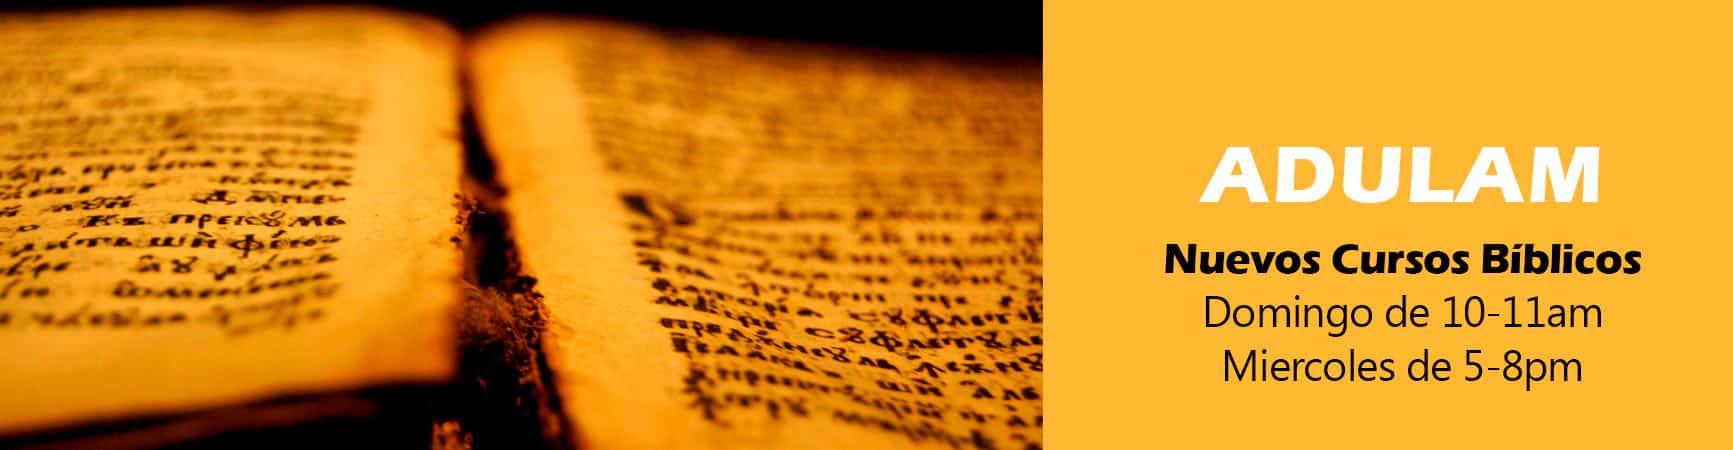 Adulam - Cursos Bíblicos para Crecimiento